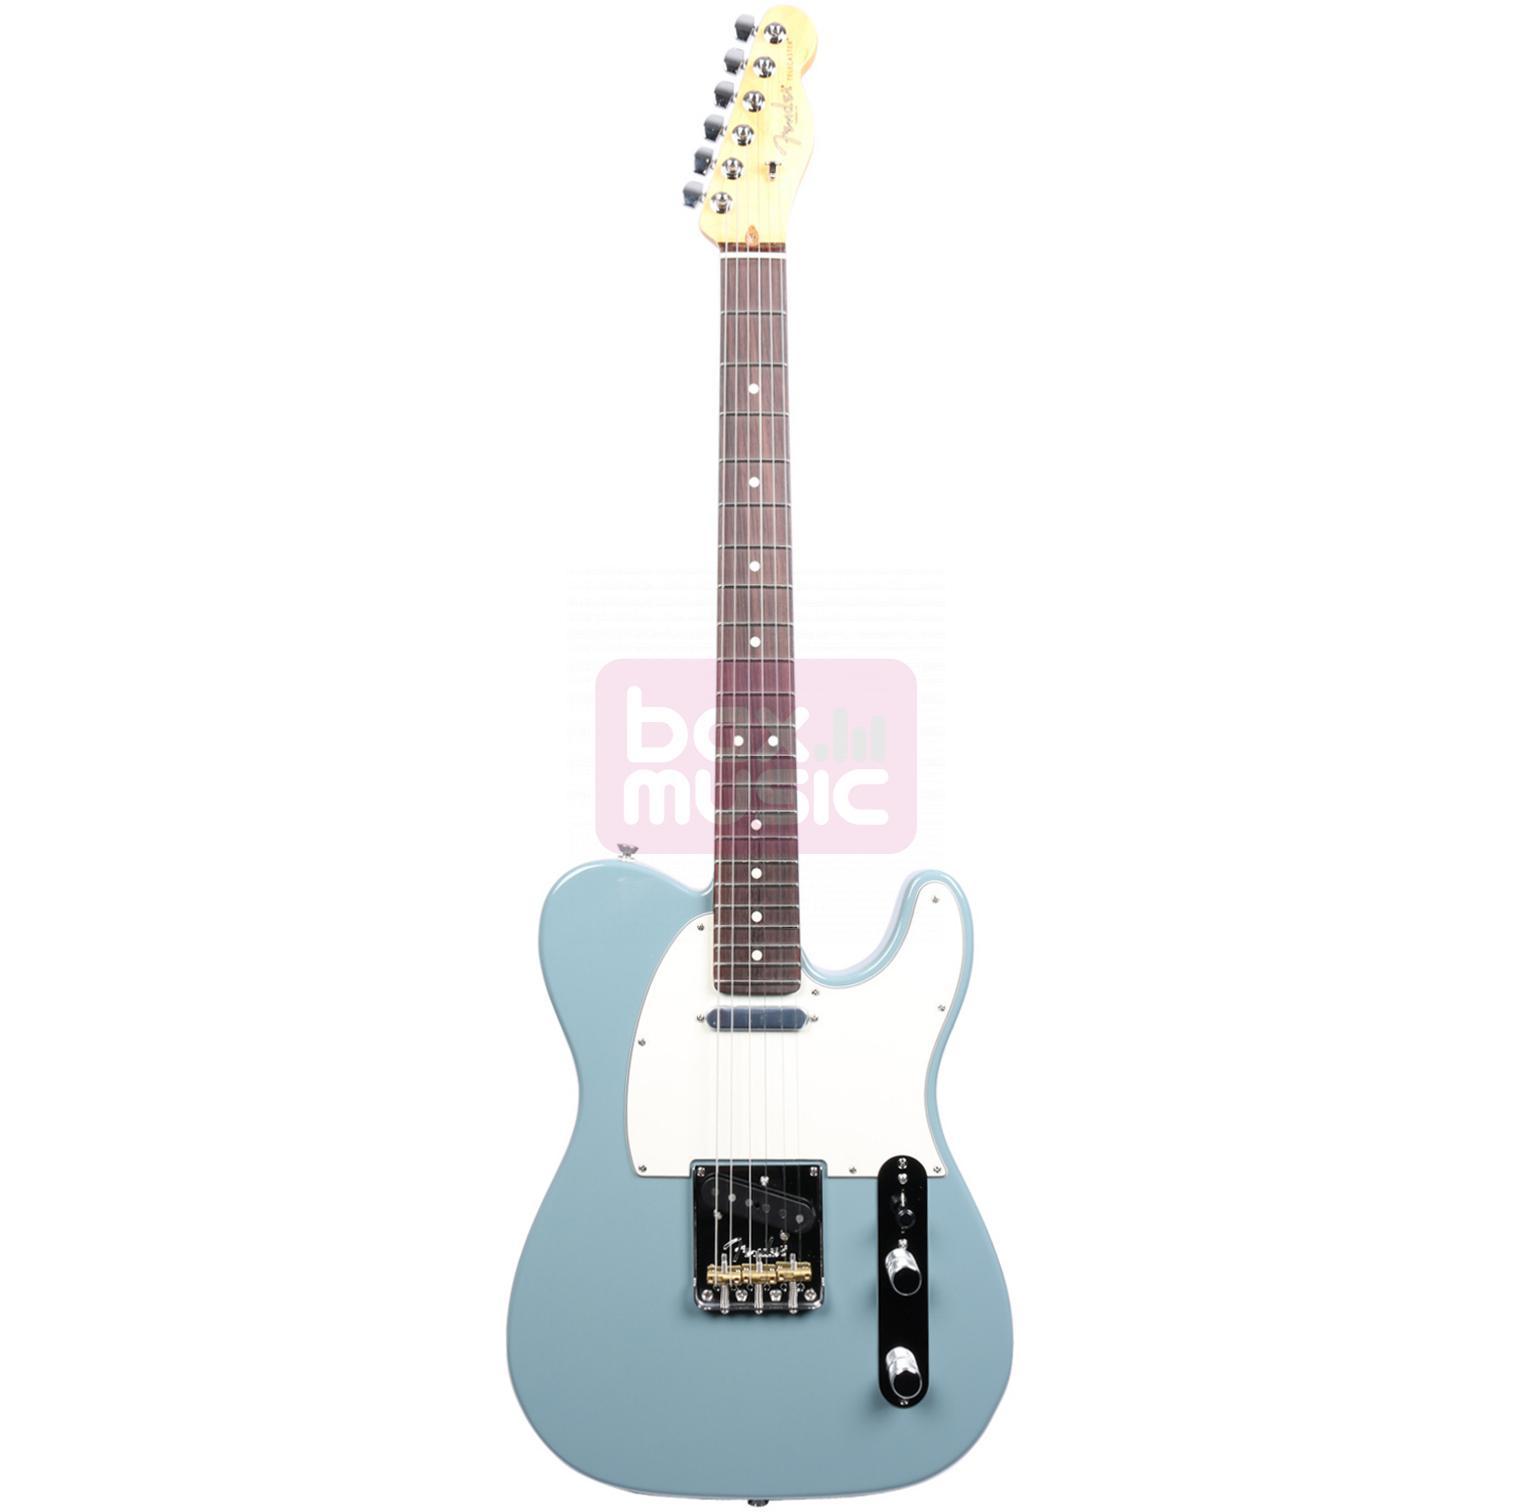 Fender American Professional Telecaster Sonic Grey RW